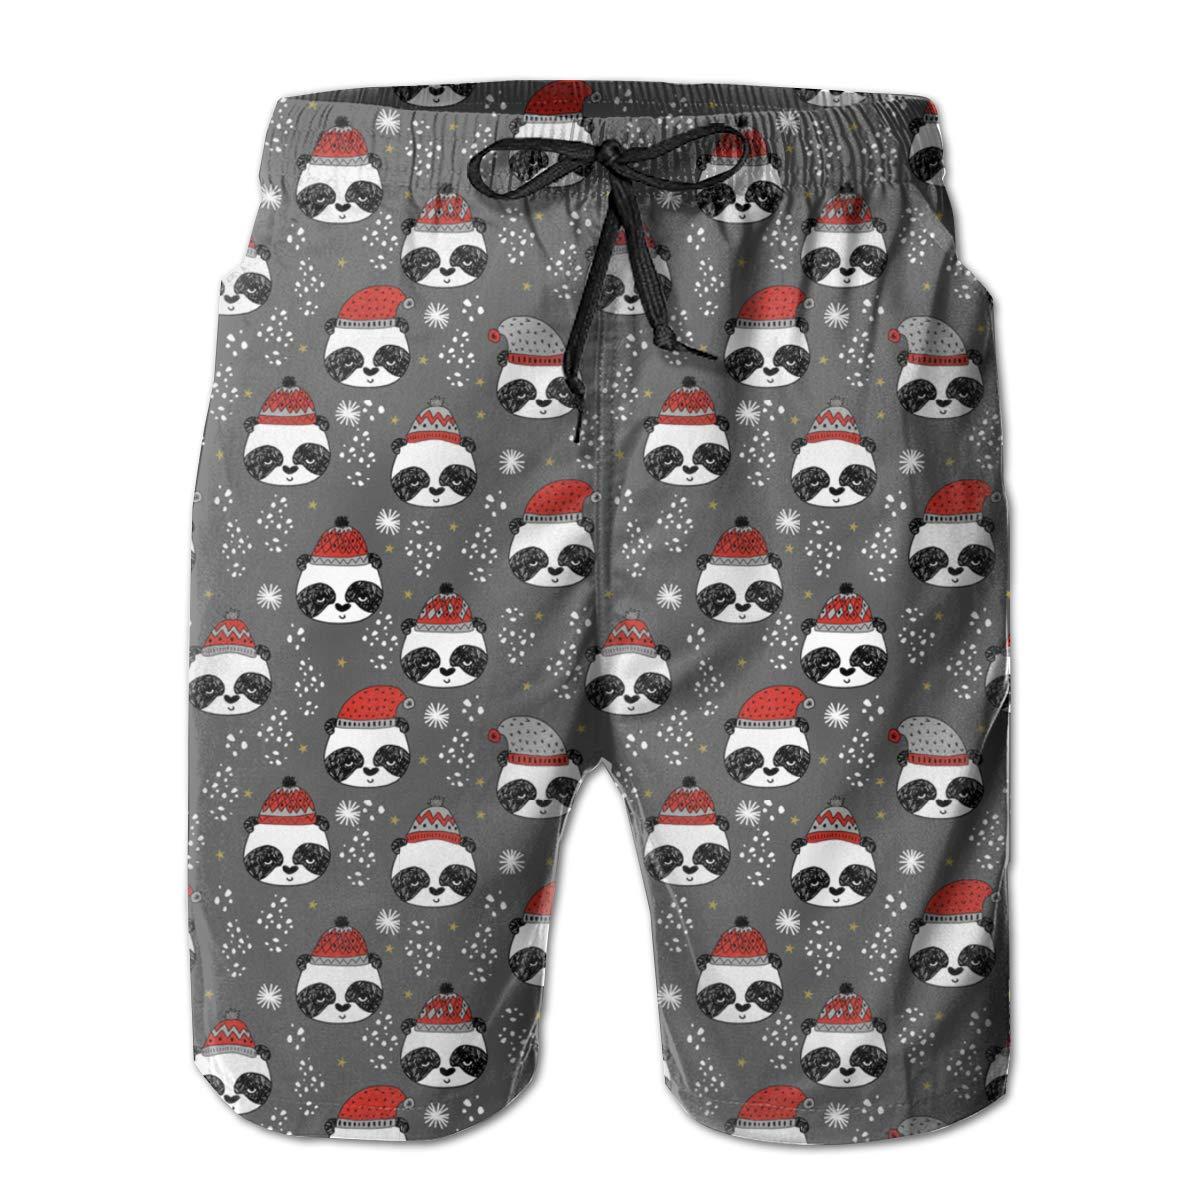 FASUWAVE Mens Swim Trunks Merry Christmas Panda Quick Dry Beach Board Shorts with Mesh Lining